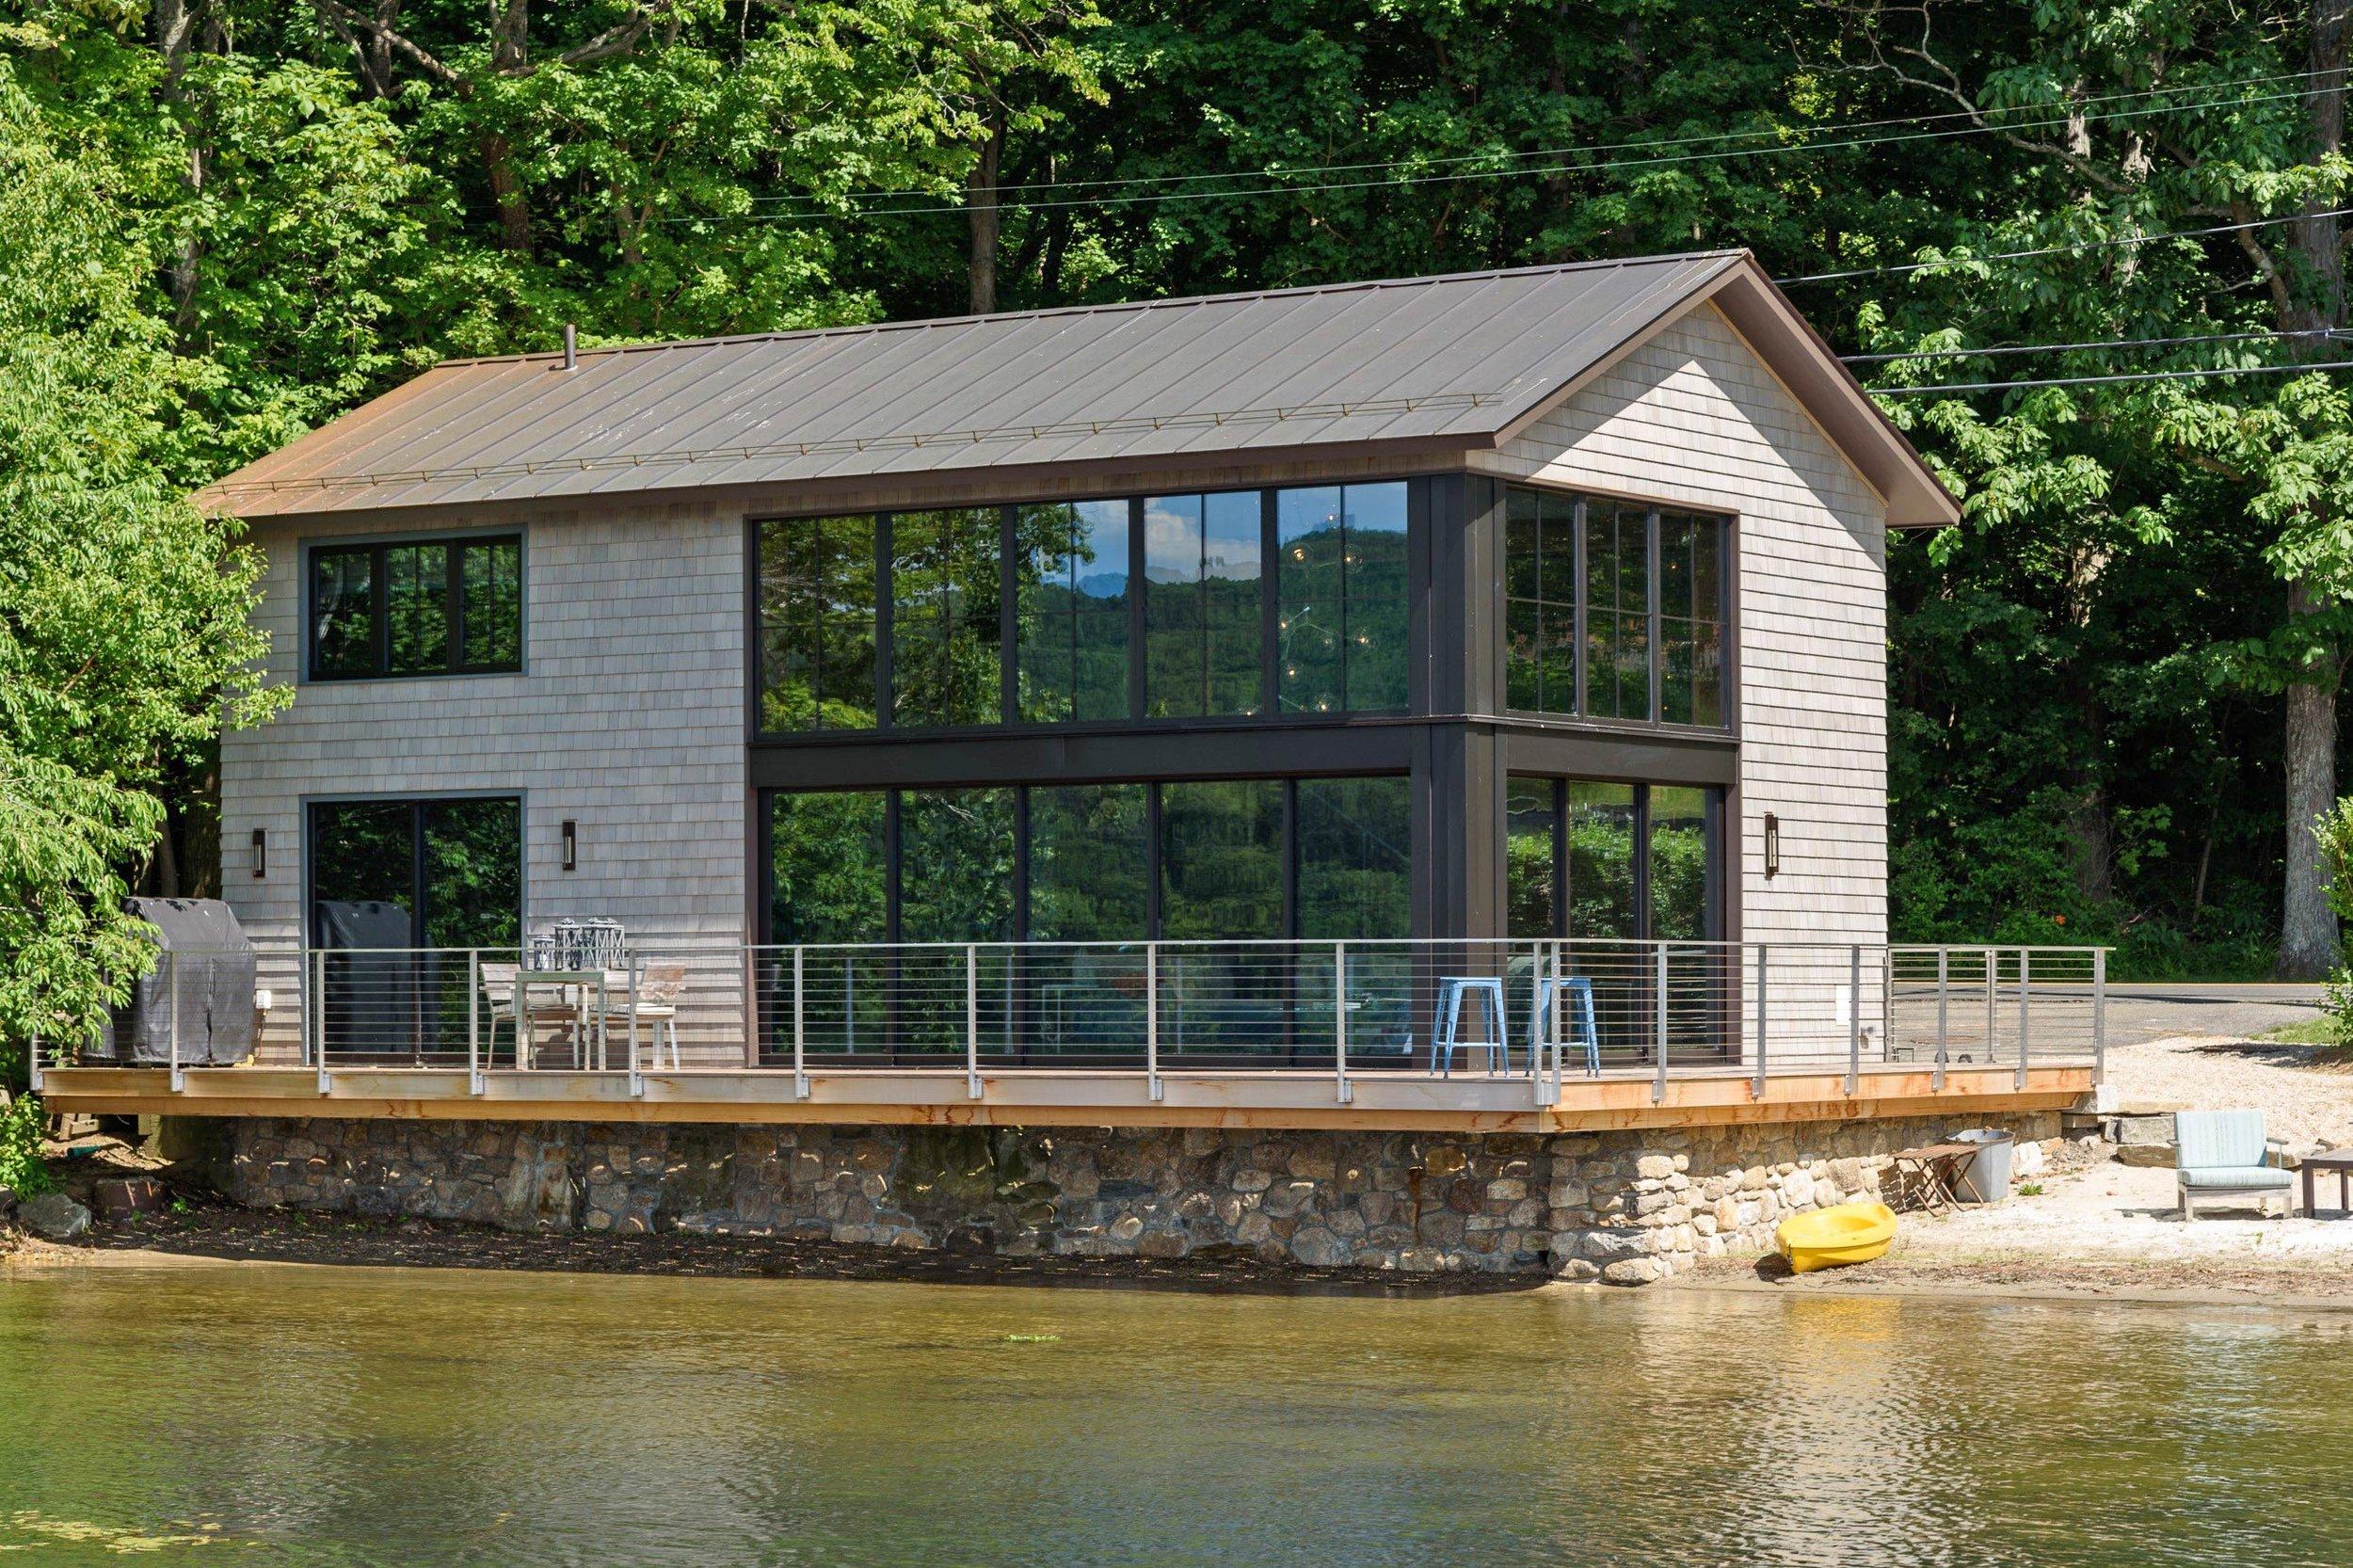 Boathouse-010-EDIT.jpg